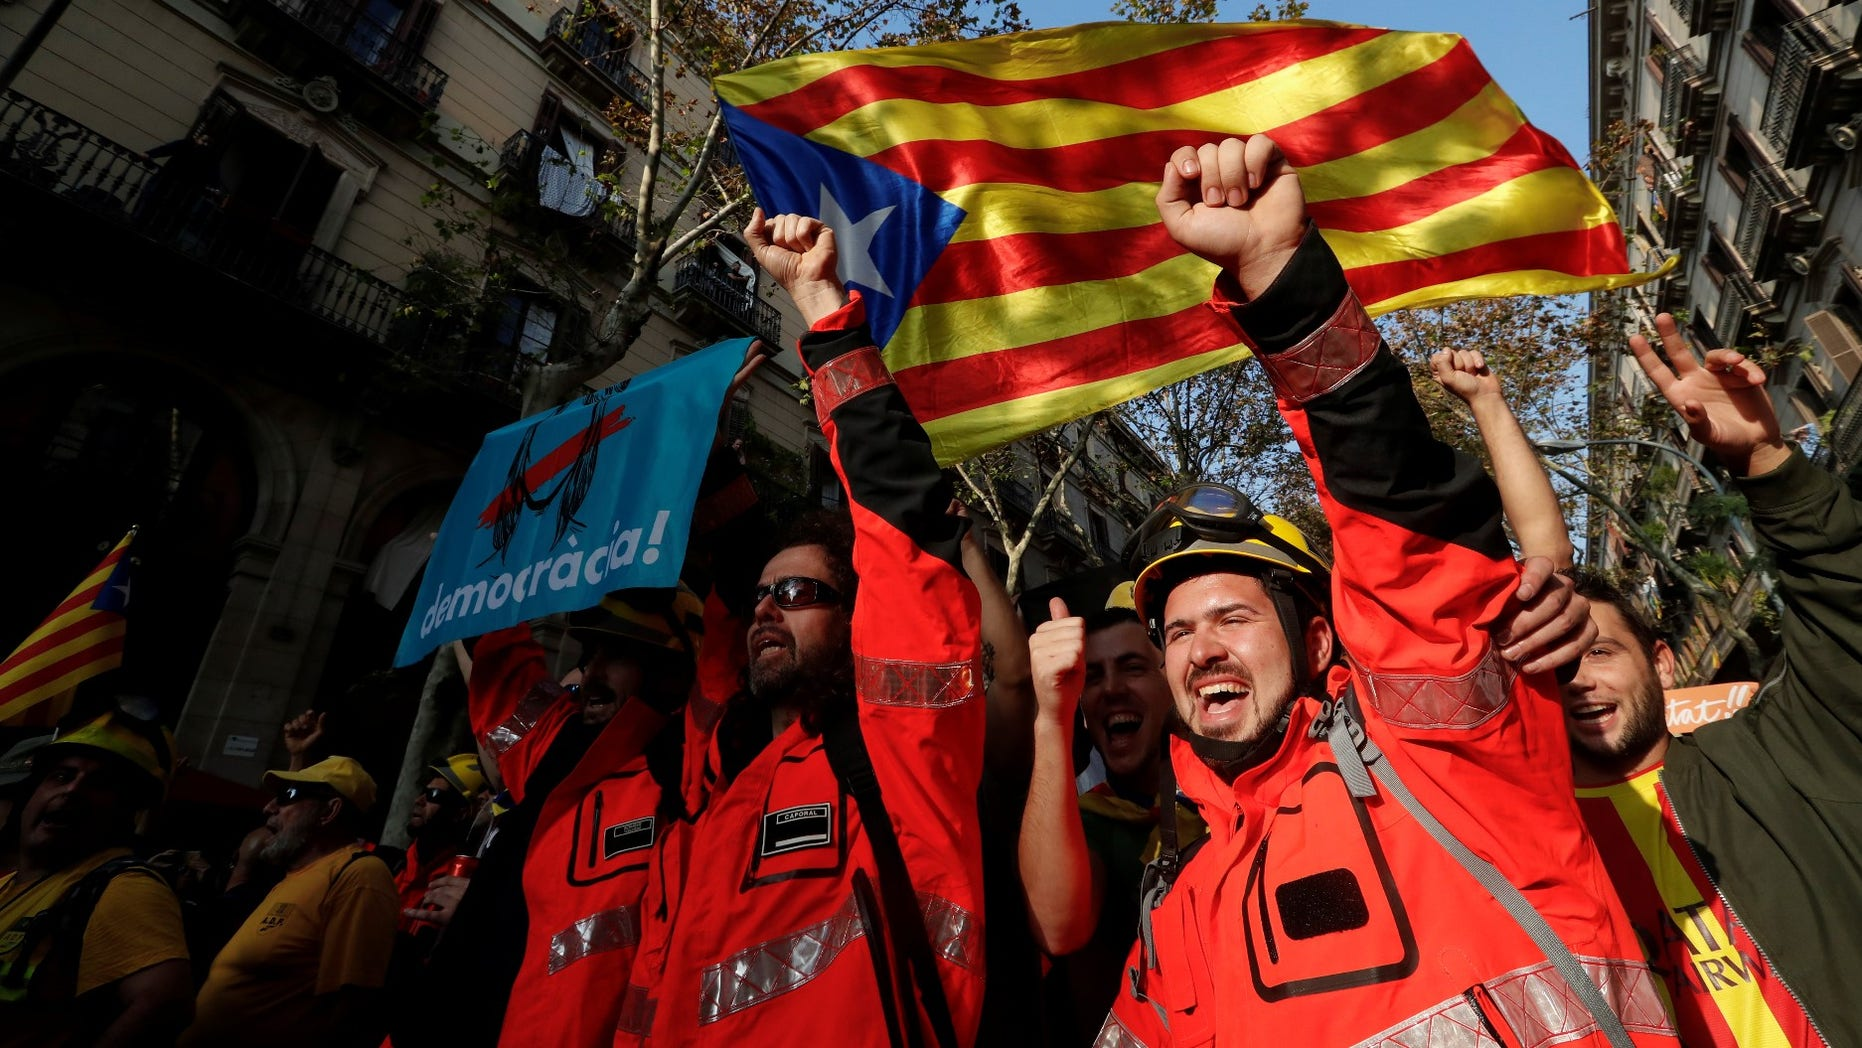 Firemen shout slongans under an Estelada (Catalan separatist flag) during a march in Barcelona, Spain, October 27, 2017.